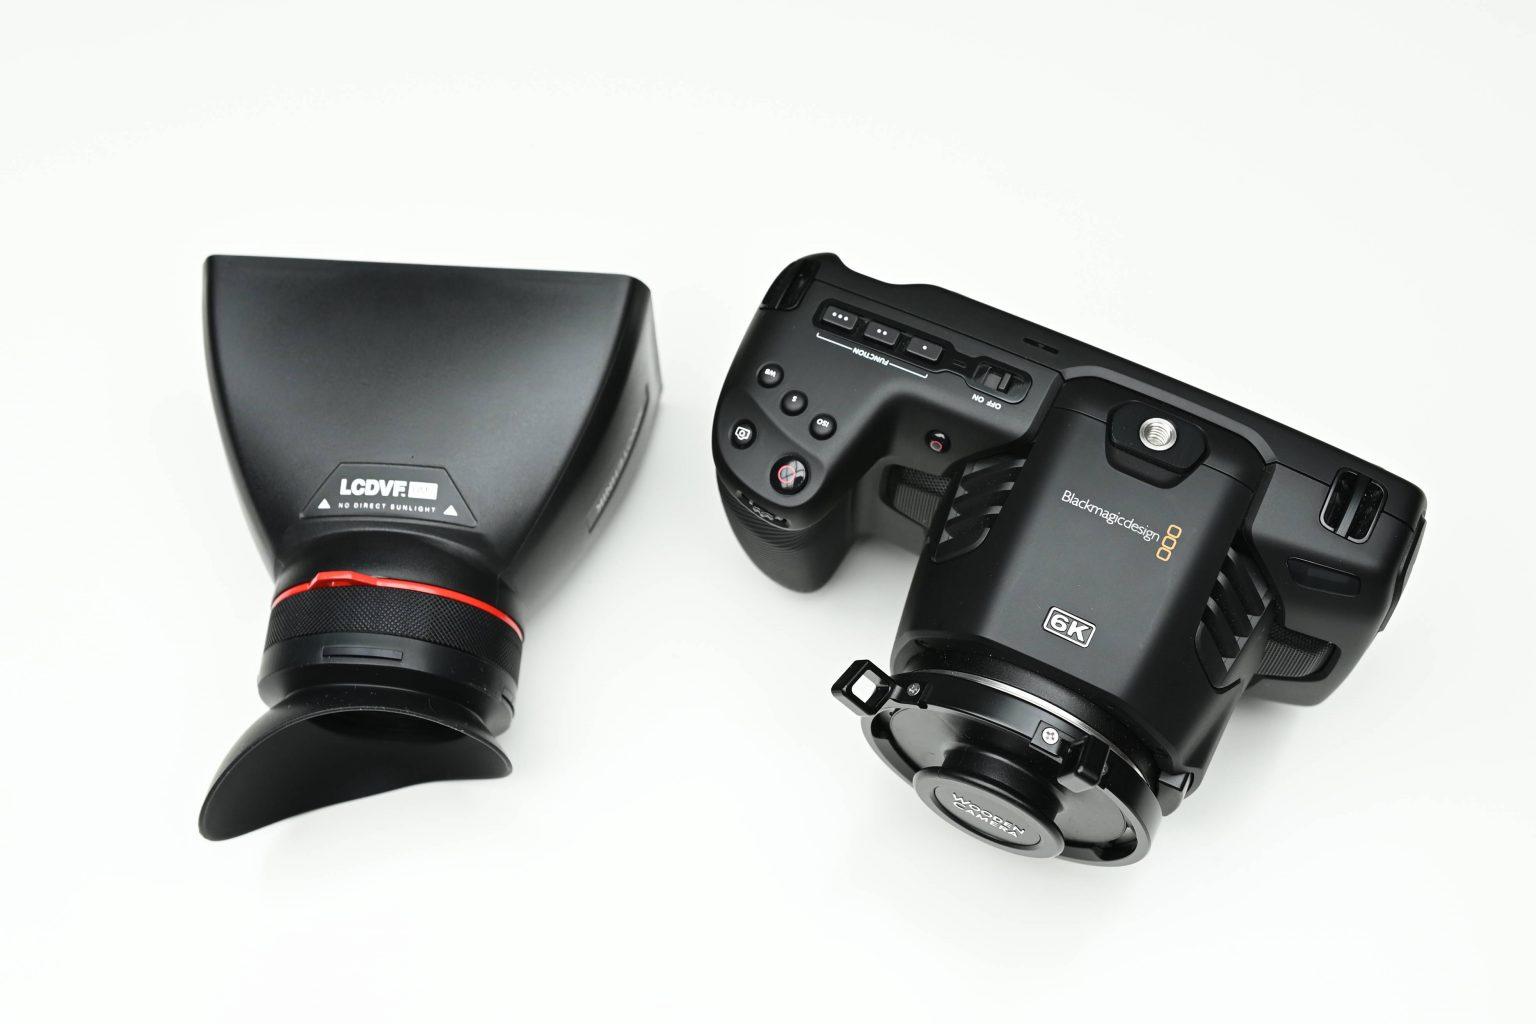 LCDVFBM5 LCDVF Viewfinder BlackMagic 4K and 6K sun hood screen video BMPCC 4K 6K review